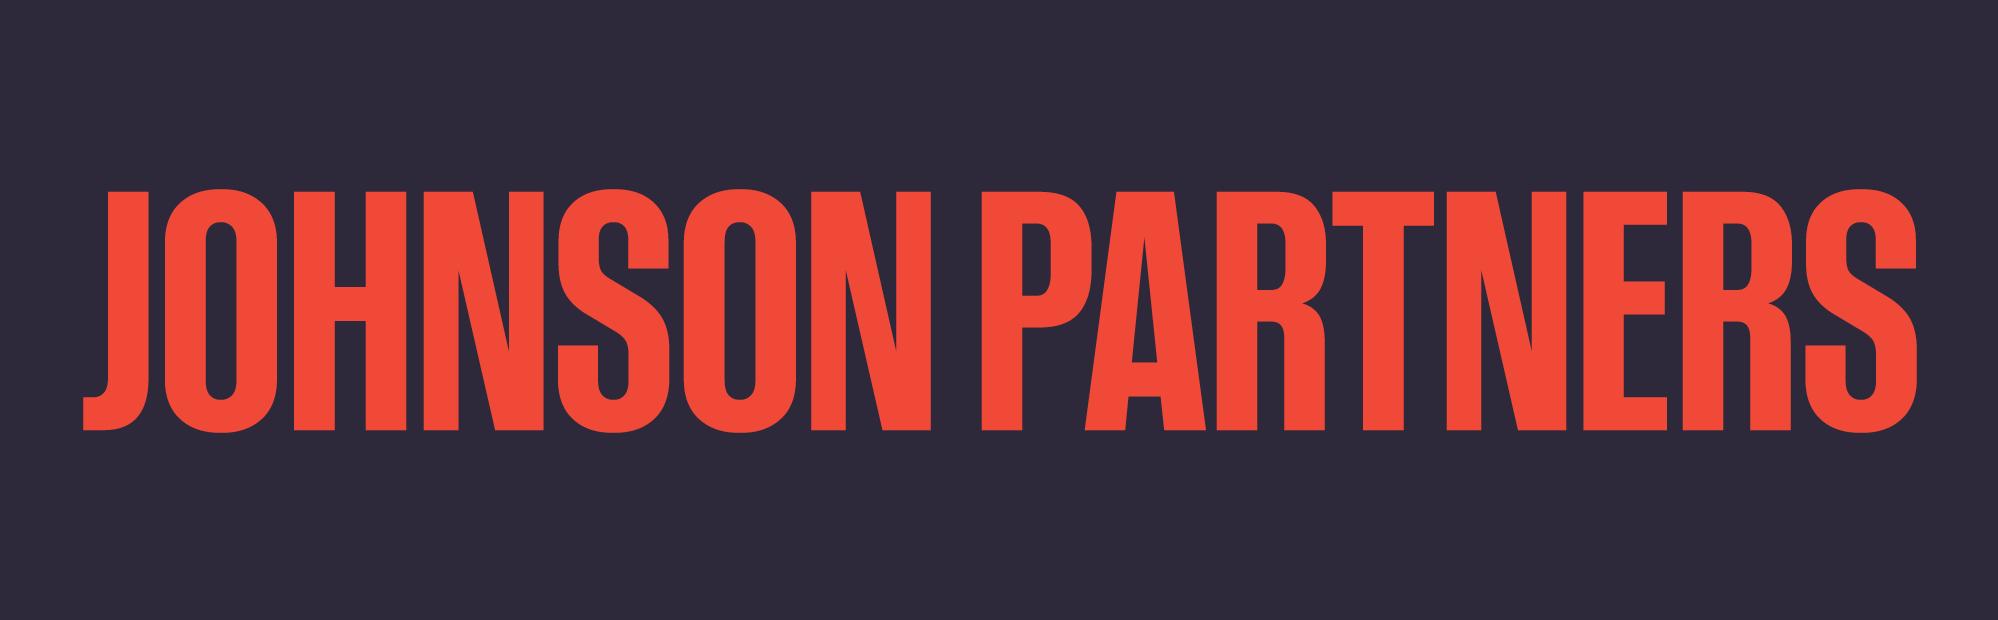 Research Associate - Johnson Partners profile banner profile banner